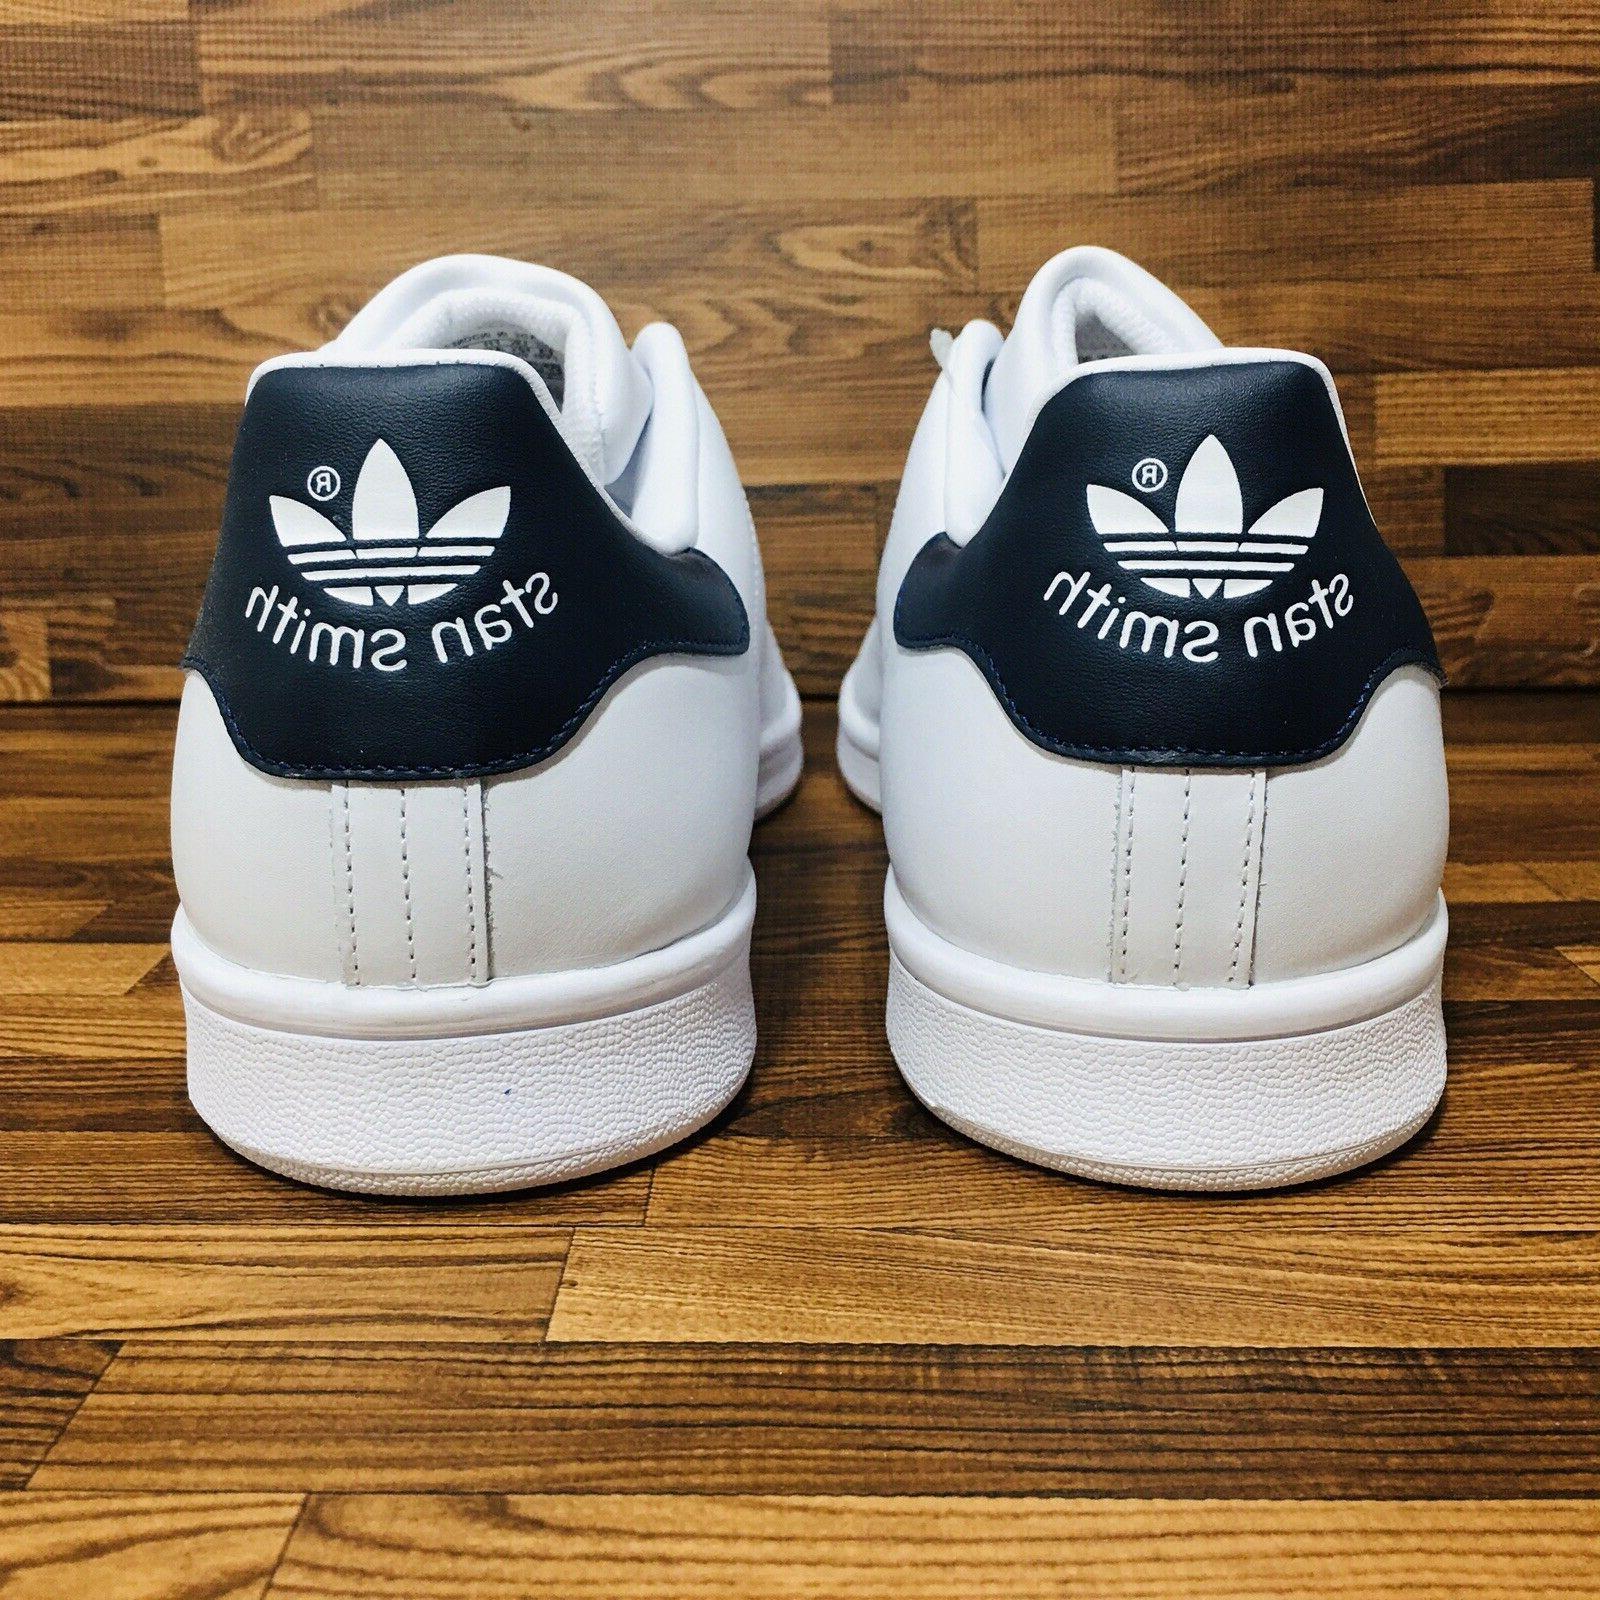 Adidas Originals Men's Casual Sneaker White Blue